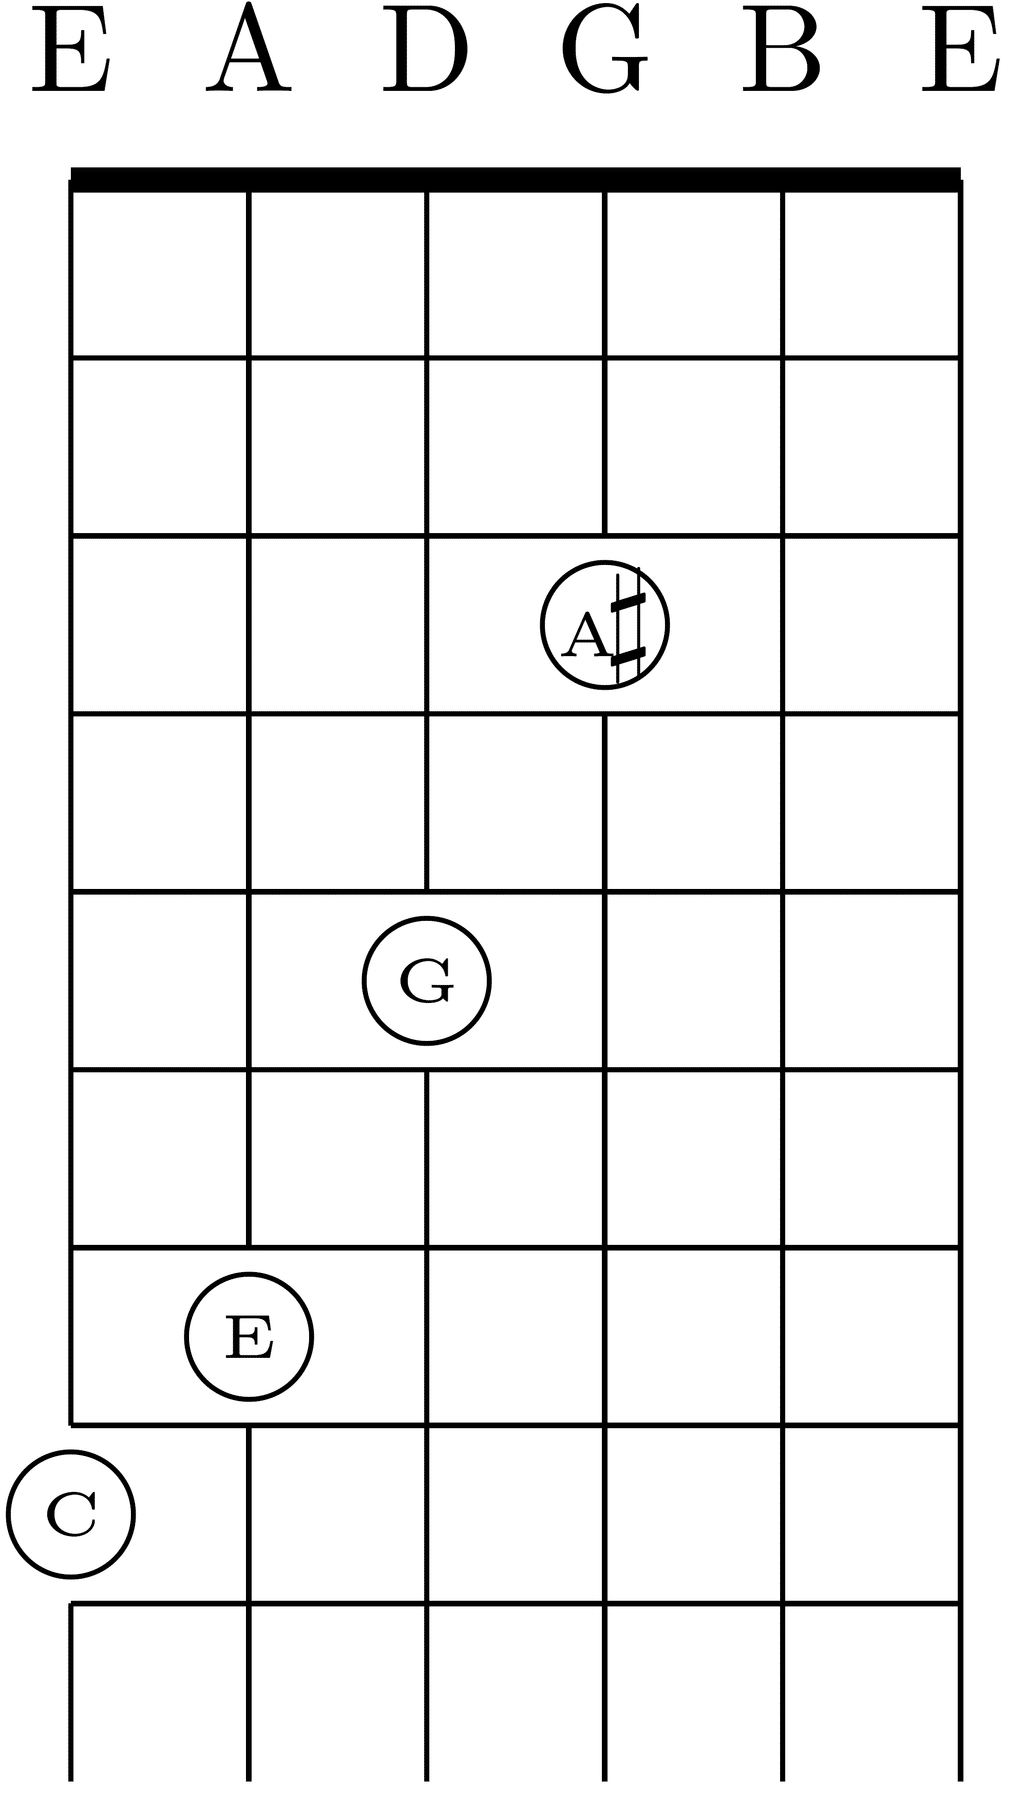 C7 chord in standard tuning